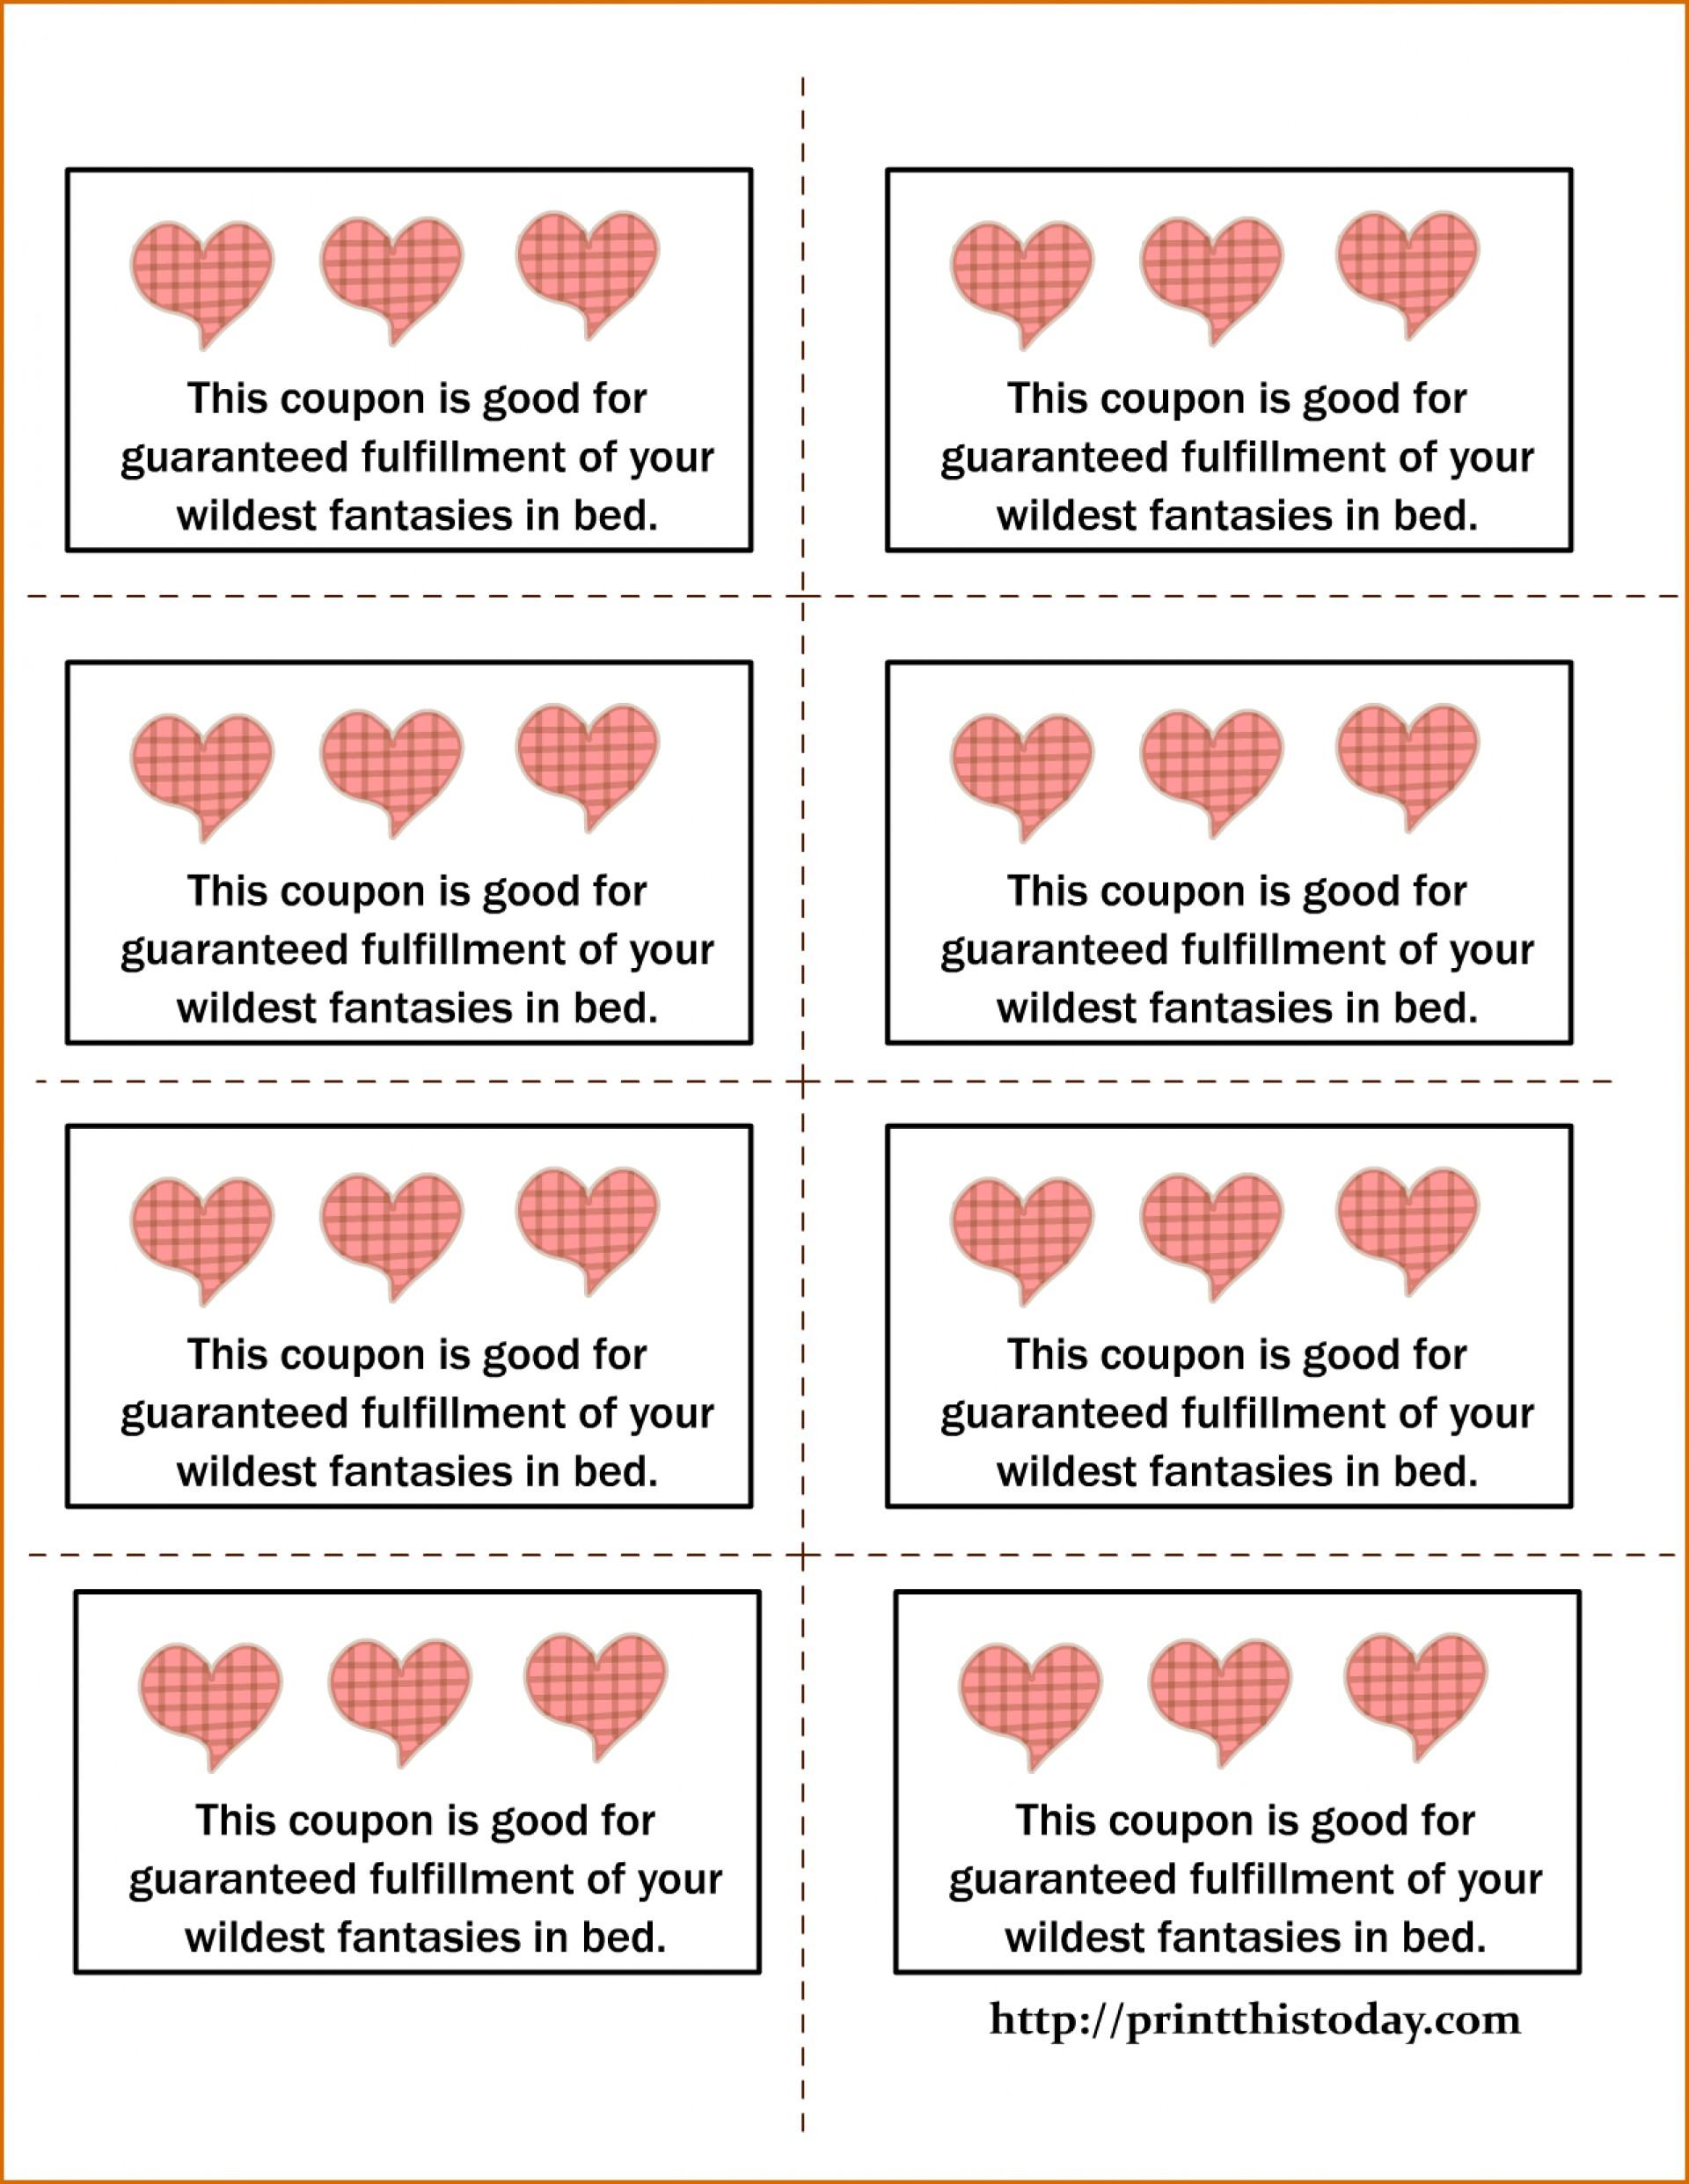 001 Free Printable Coupon Templates Template Ideas Surprising Book - Free Printable Coupon Templates